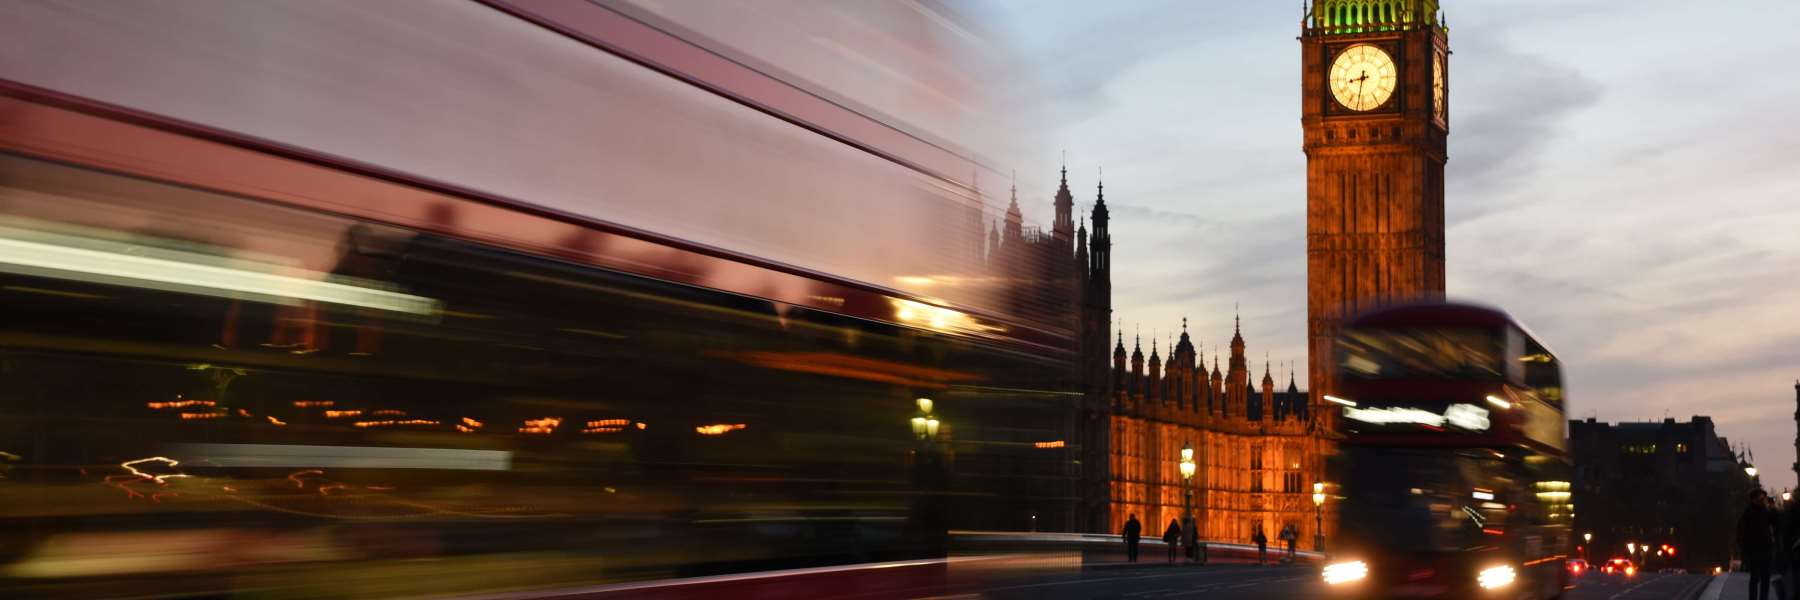 City Removals London